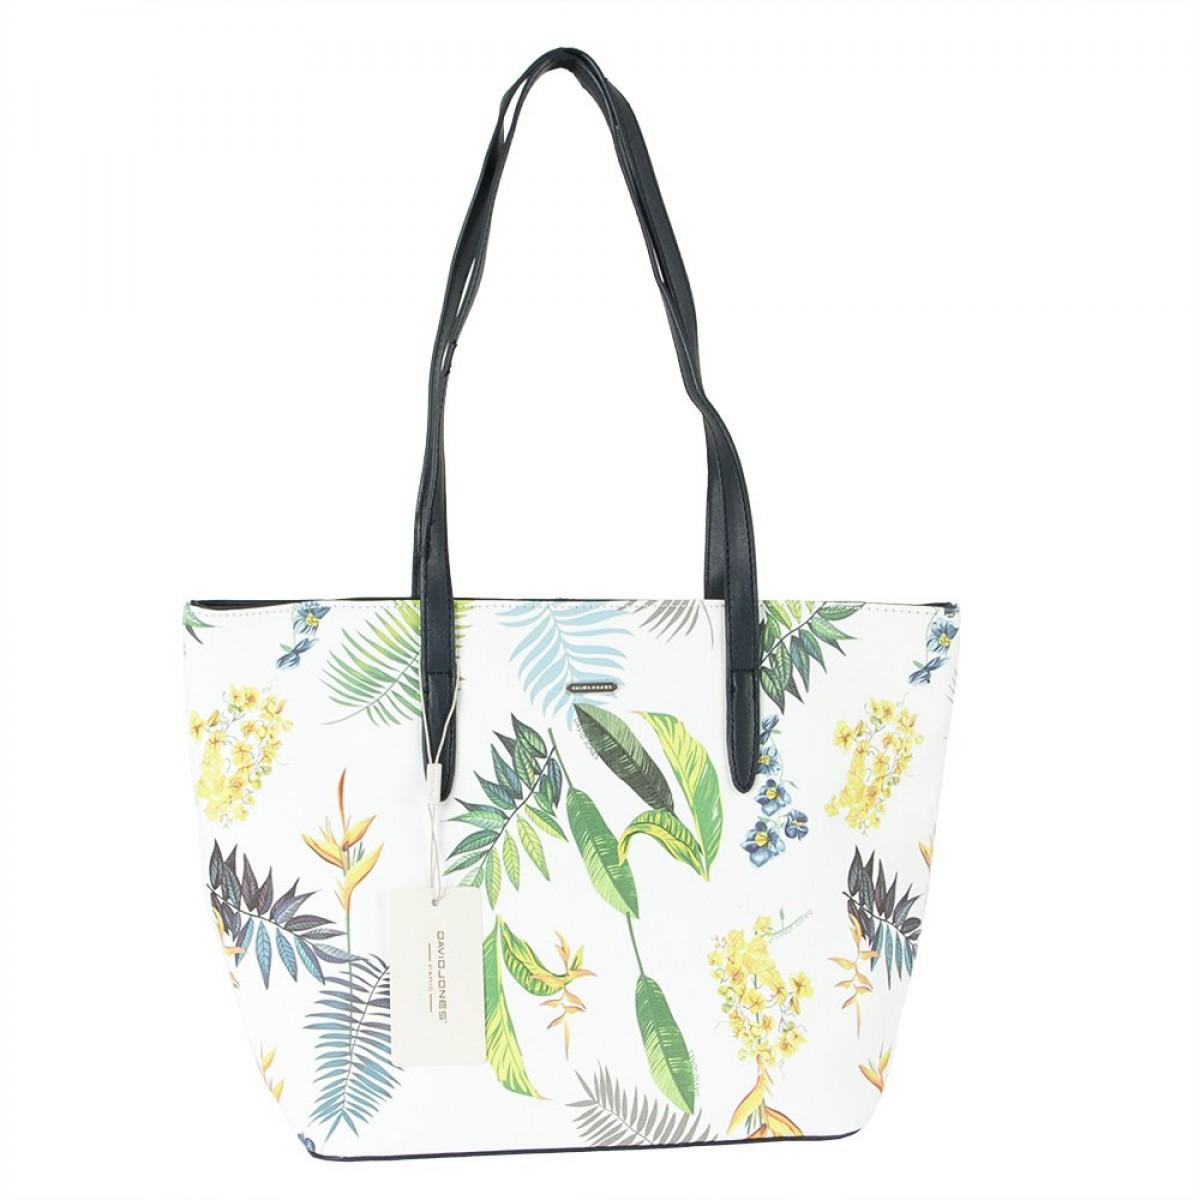 Жіноча сумка David Jones 6306-4 D.BLUE